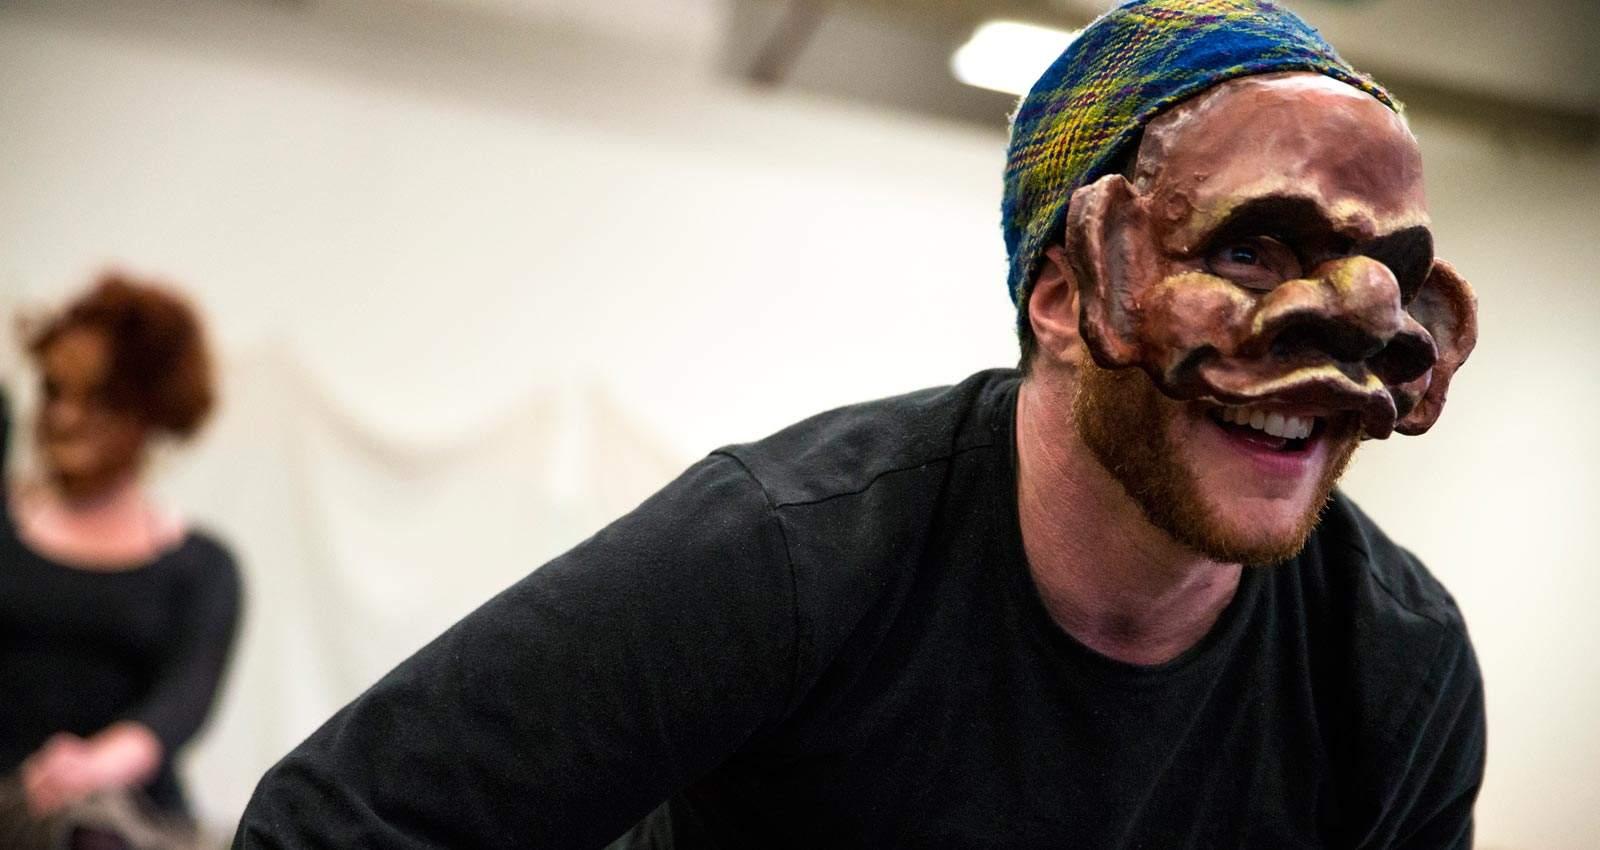 Mask Work and Body Language